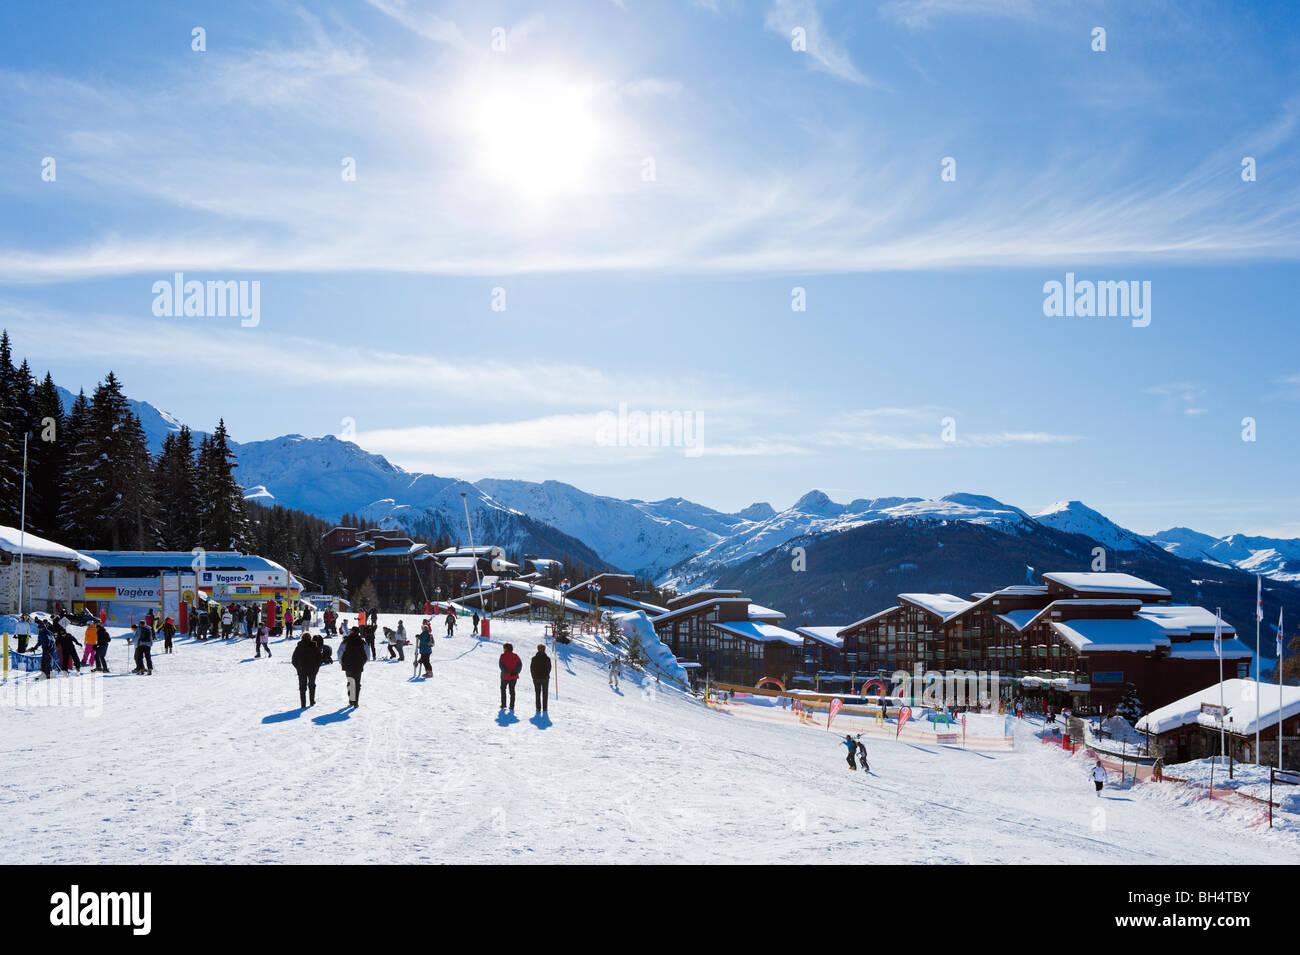 Fondo di piste nel centro del resort, Arc 1800, Les Arcs, Tarentaise, Savoie, Francia Immagini Stock